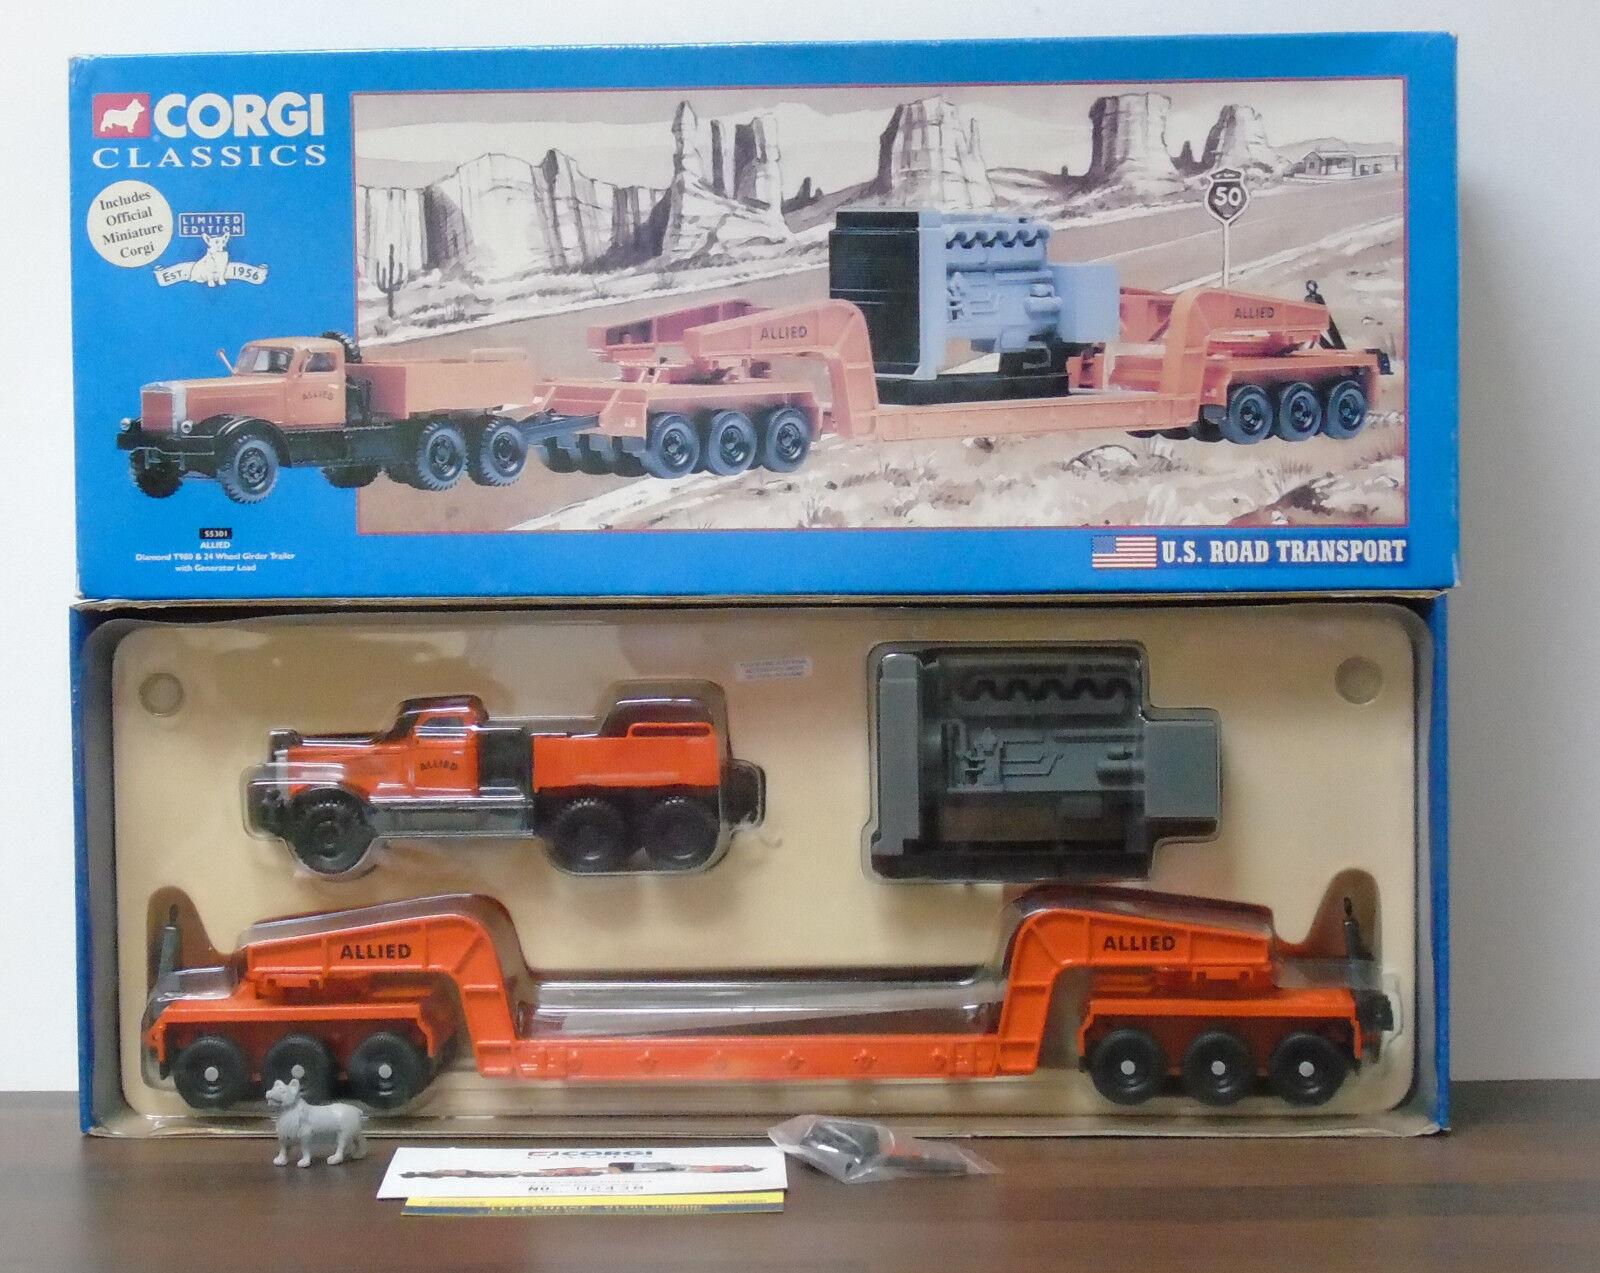 Corgi 55301 ALLIED Diamond T980 & 24 Wheel Girder Trailer with Generator Load